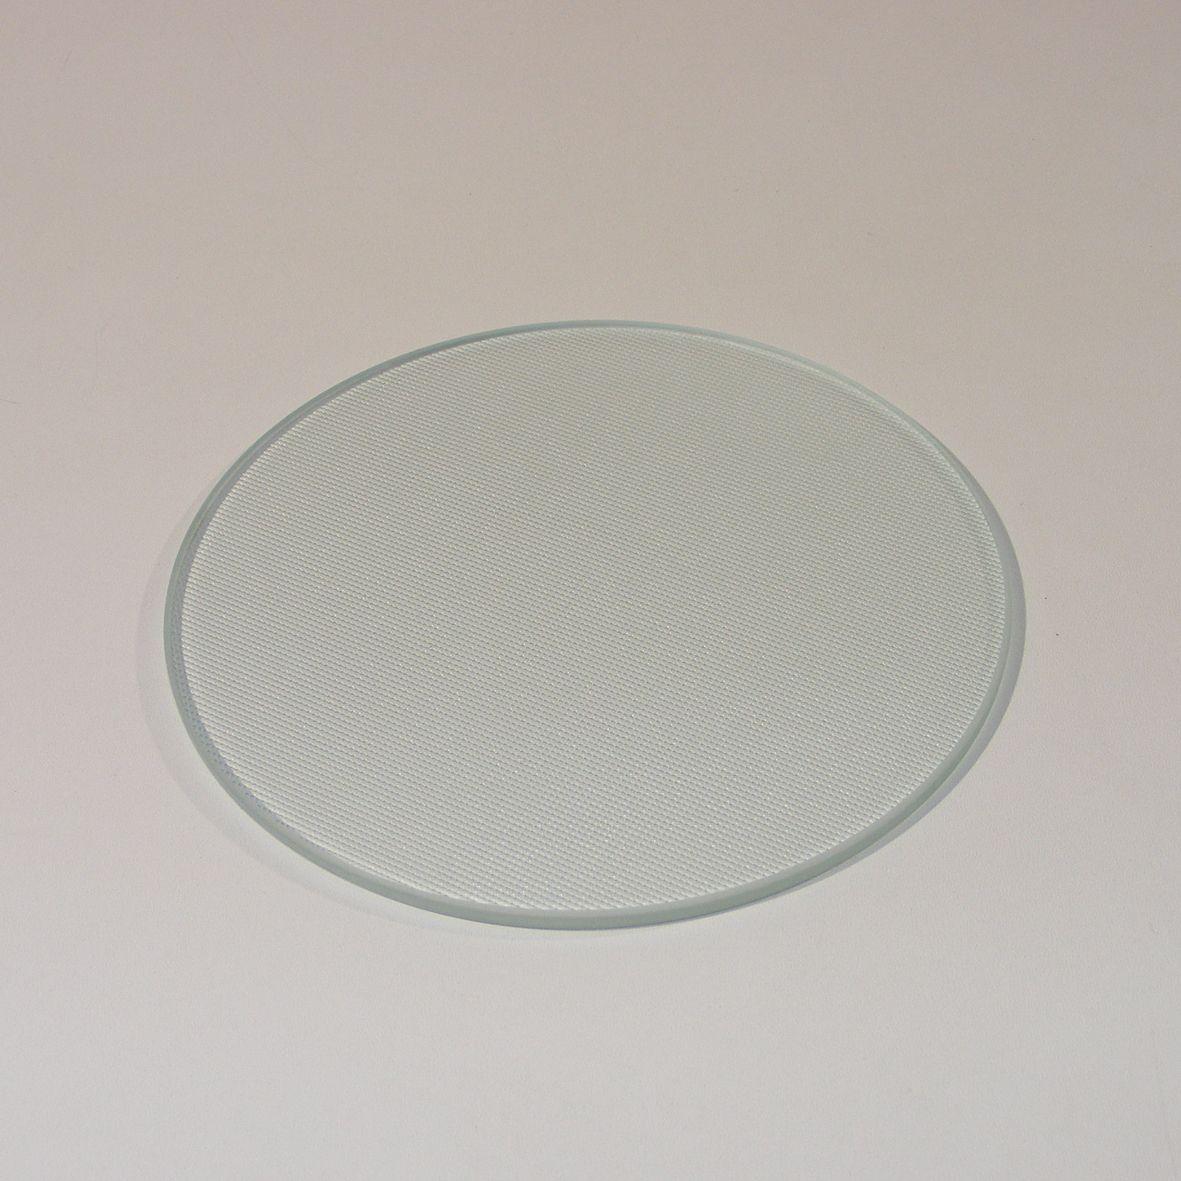 Oase Lampenglas LunAqua 10 20685